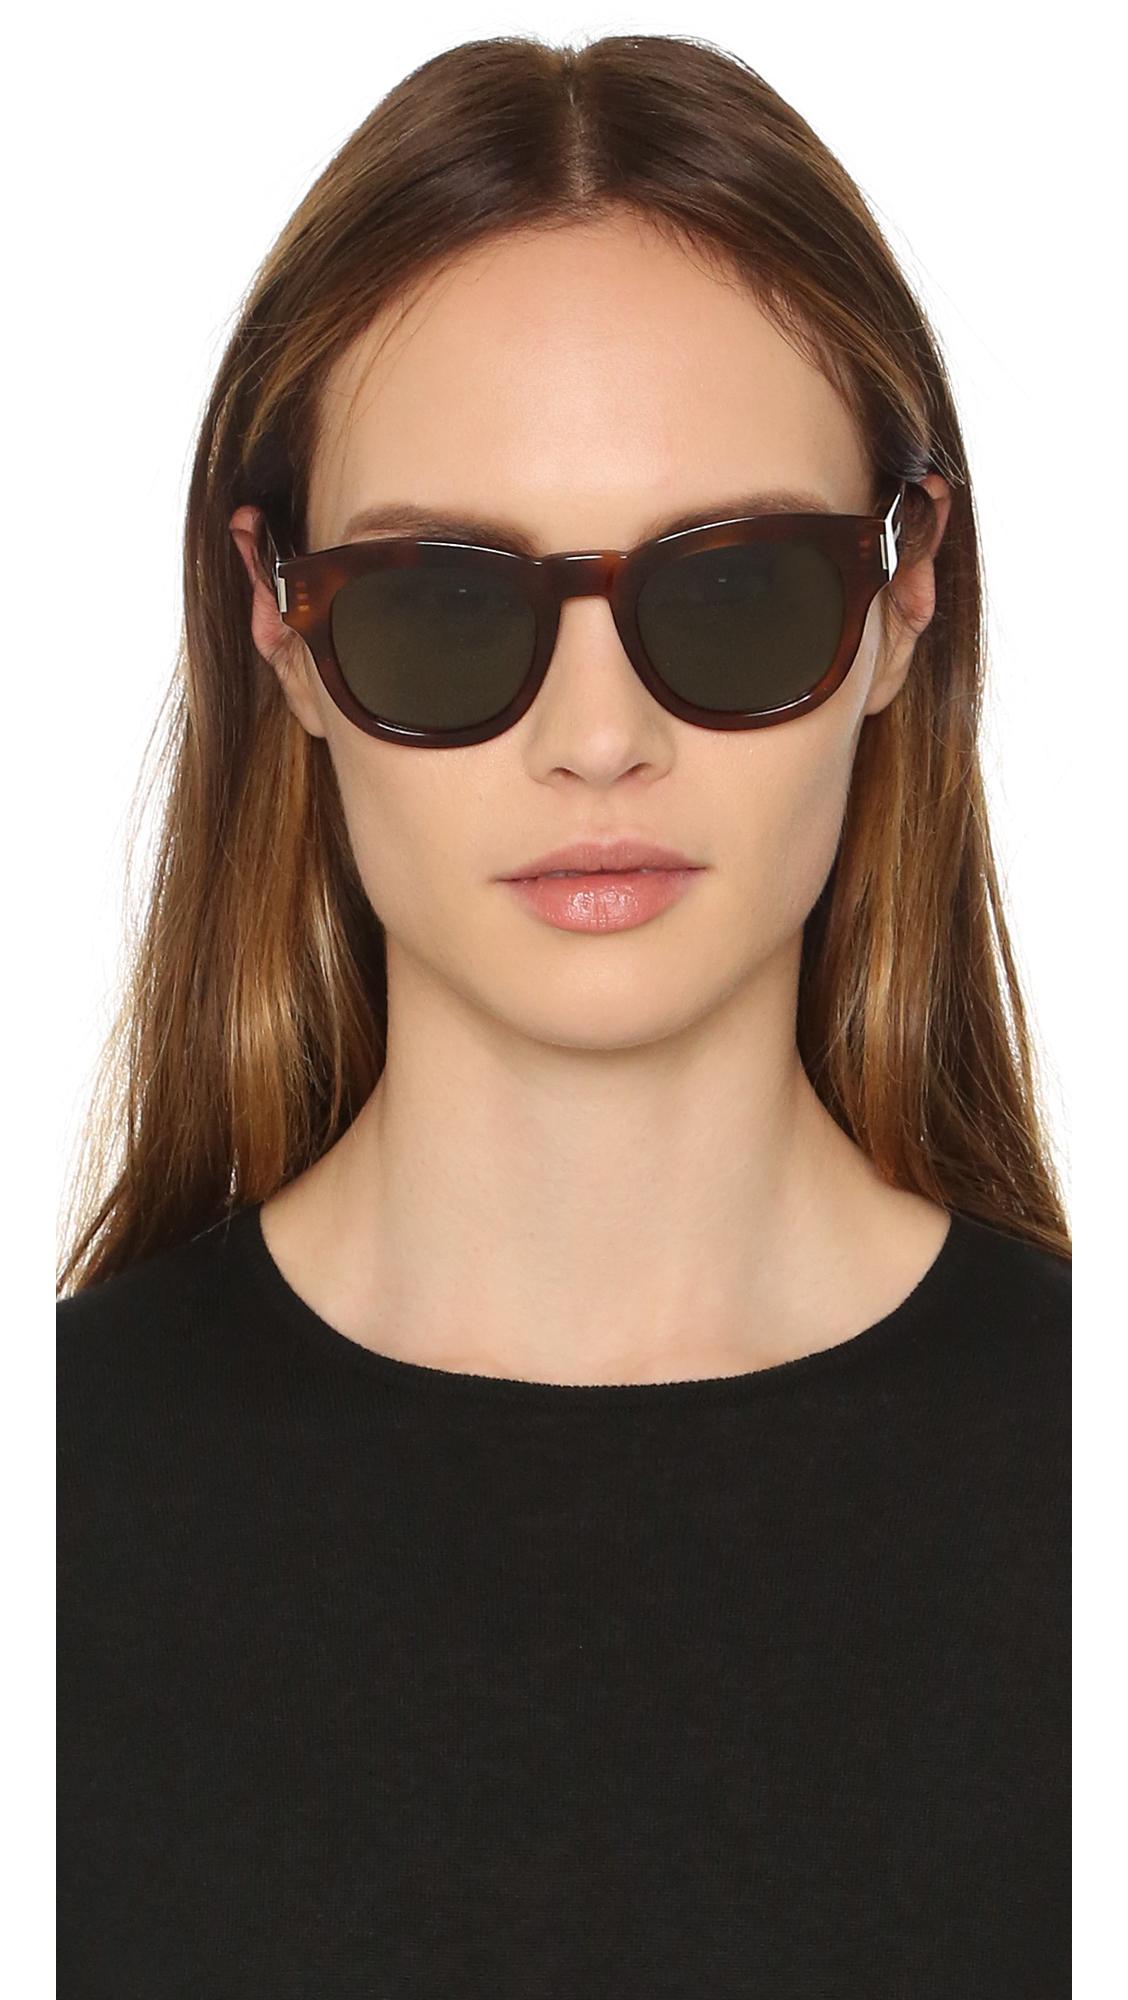 a64960c3f2 Lyst - Saint Laurent Bold 2 Mineral Glass Sunglasses in Green